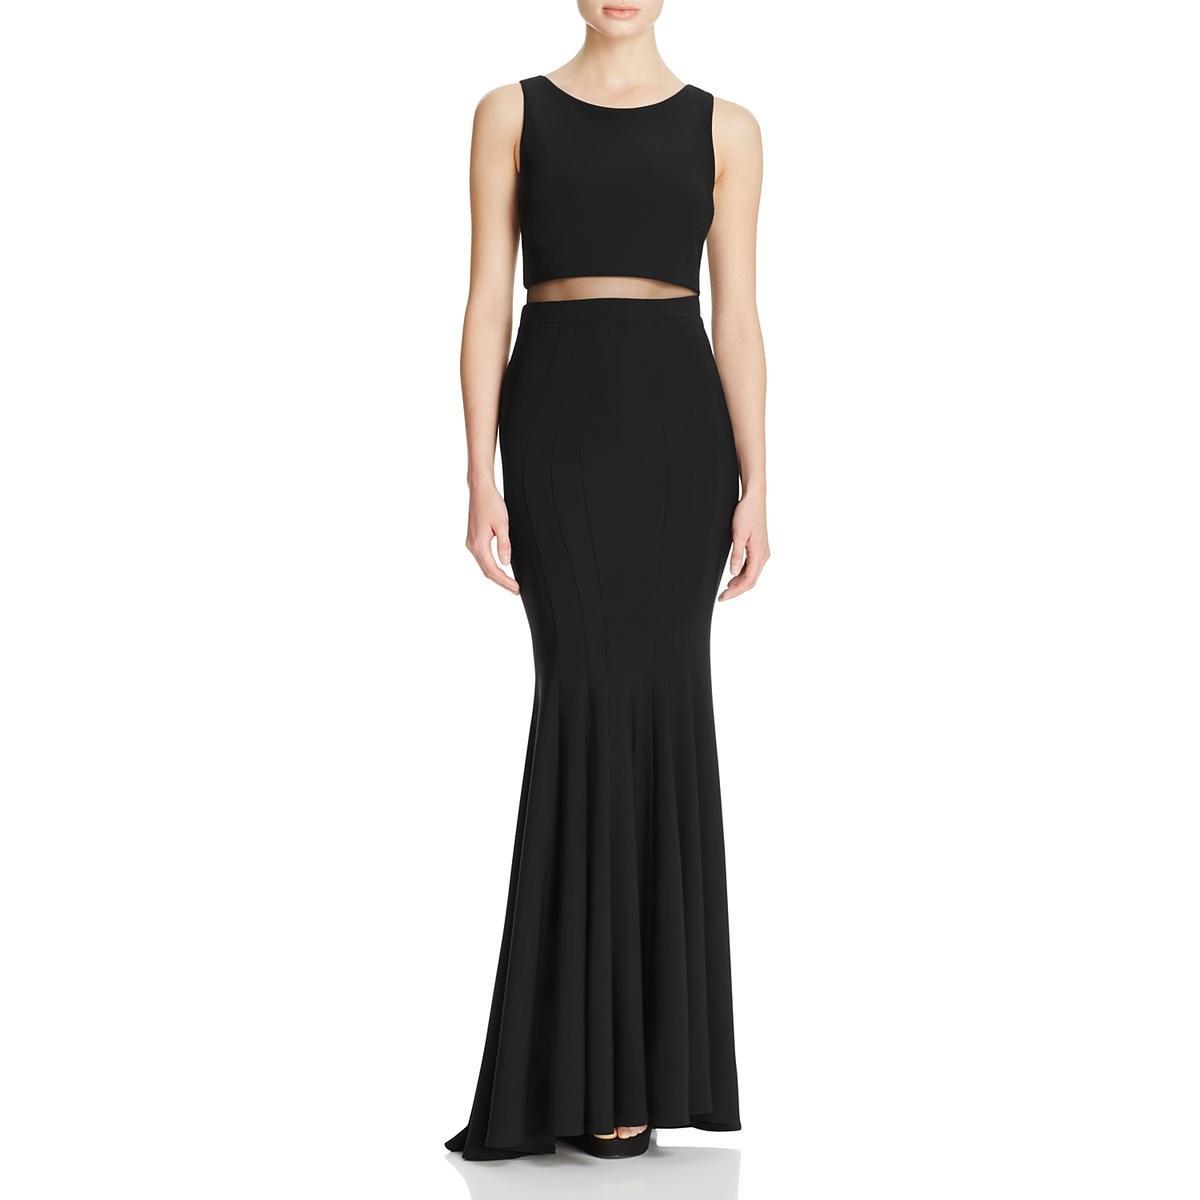 fa4357e8 Avery G Womens Illusion Mermaid Evening Dress Black 6 at Amazon Women's  Clothing store: